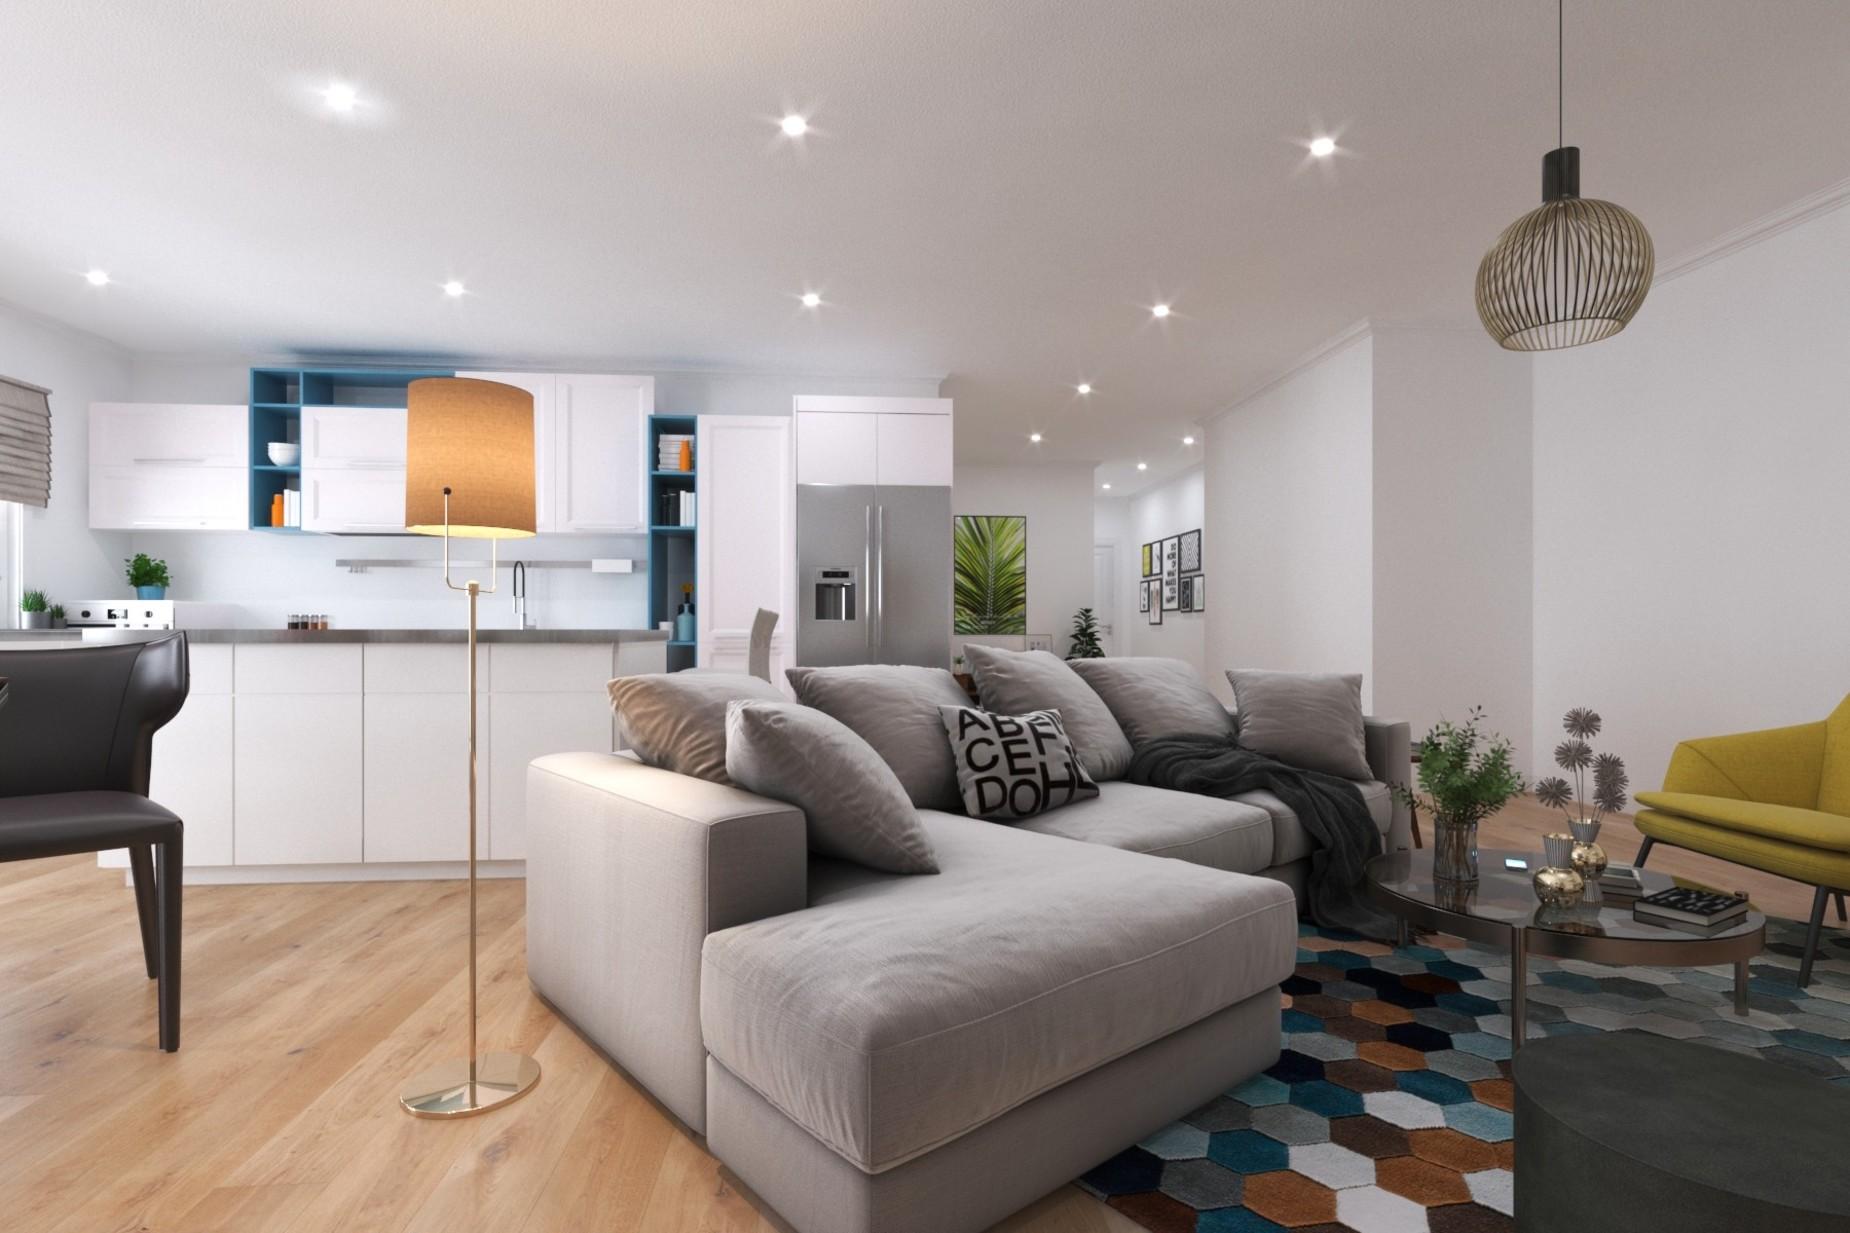 2 bed Apartment For Sale in Birkirkara, Birkirkara - thumb 3